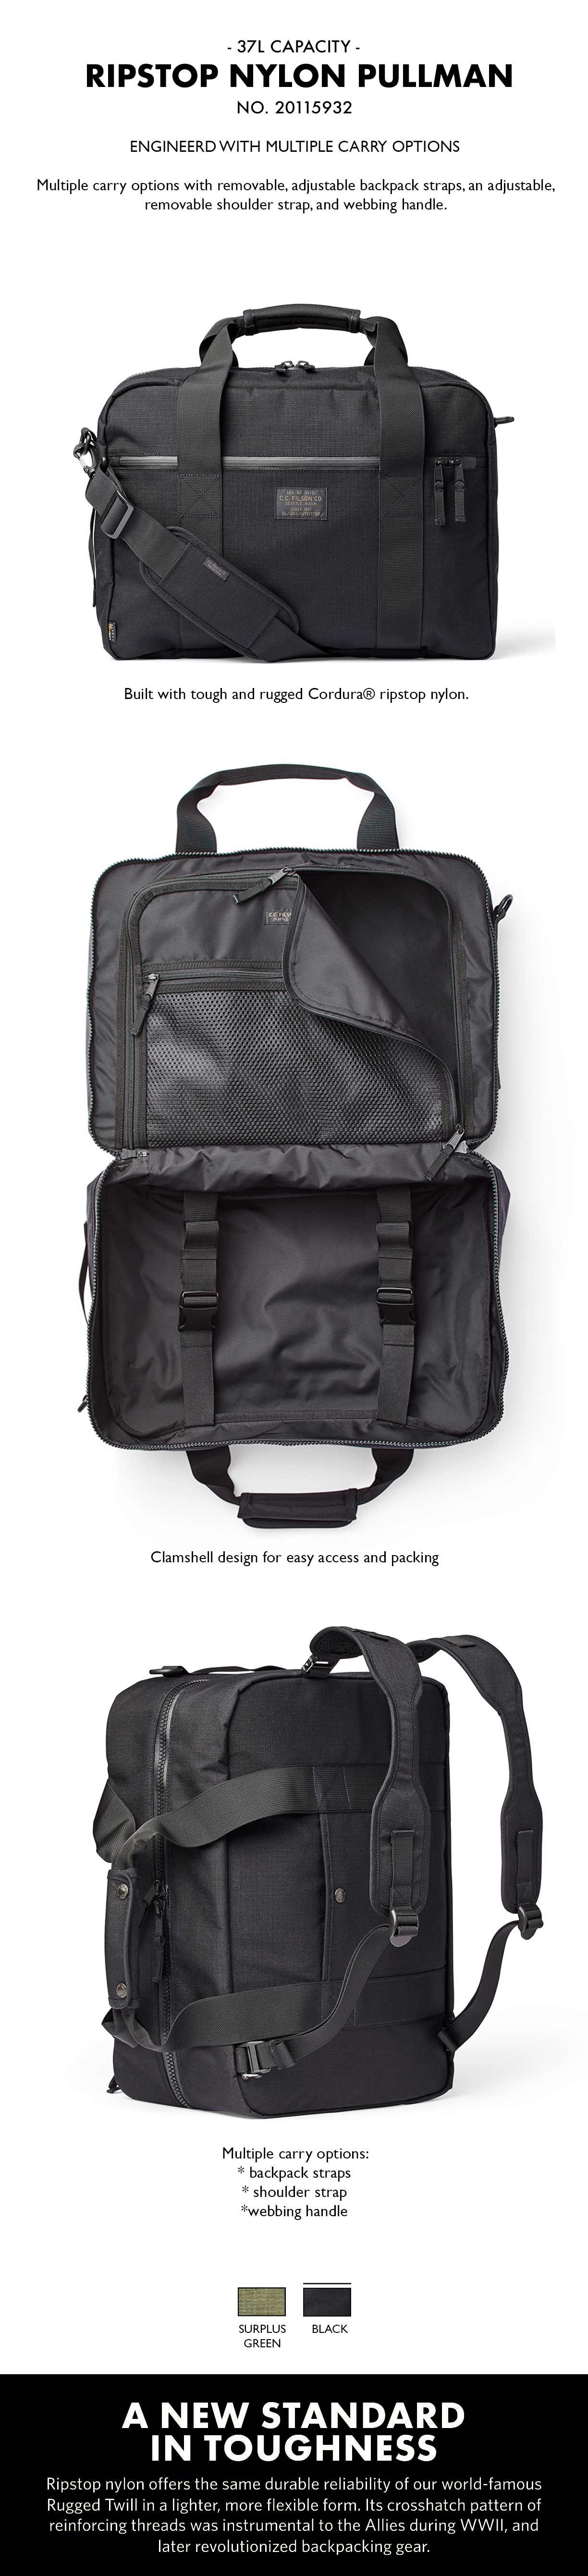 Ripstop Nylon Pullman 20115932-Black Product-information